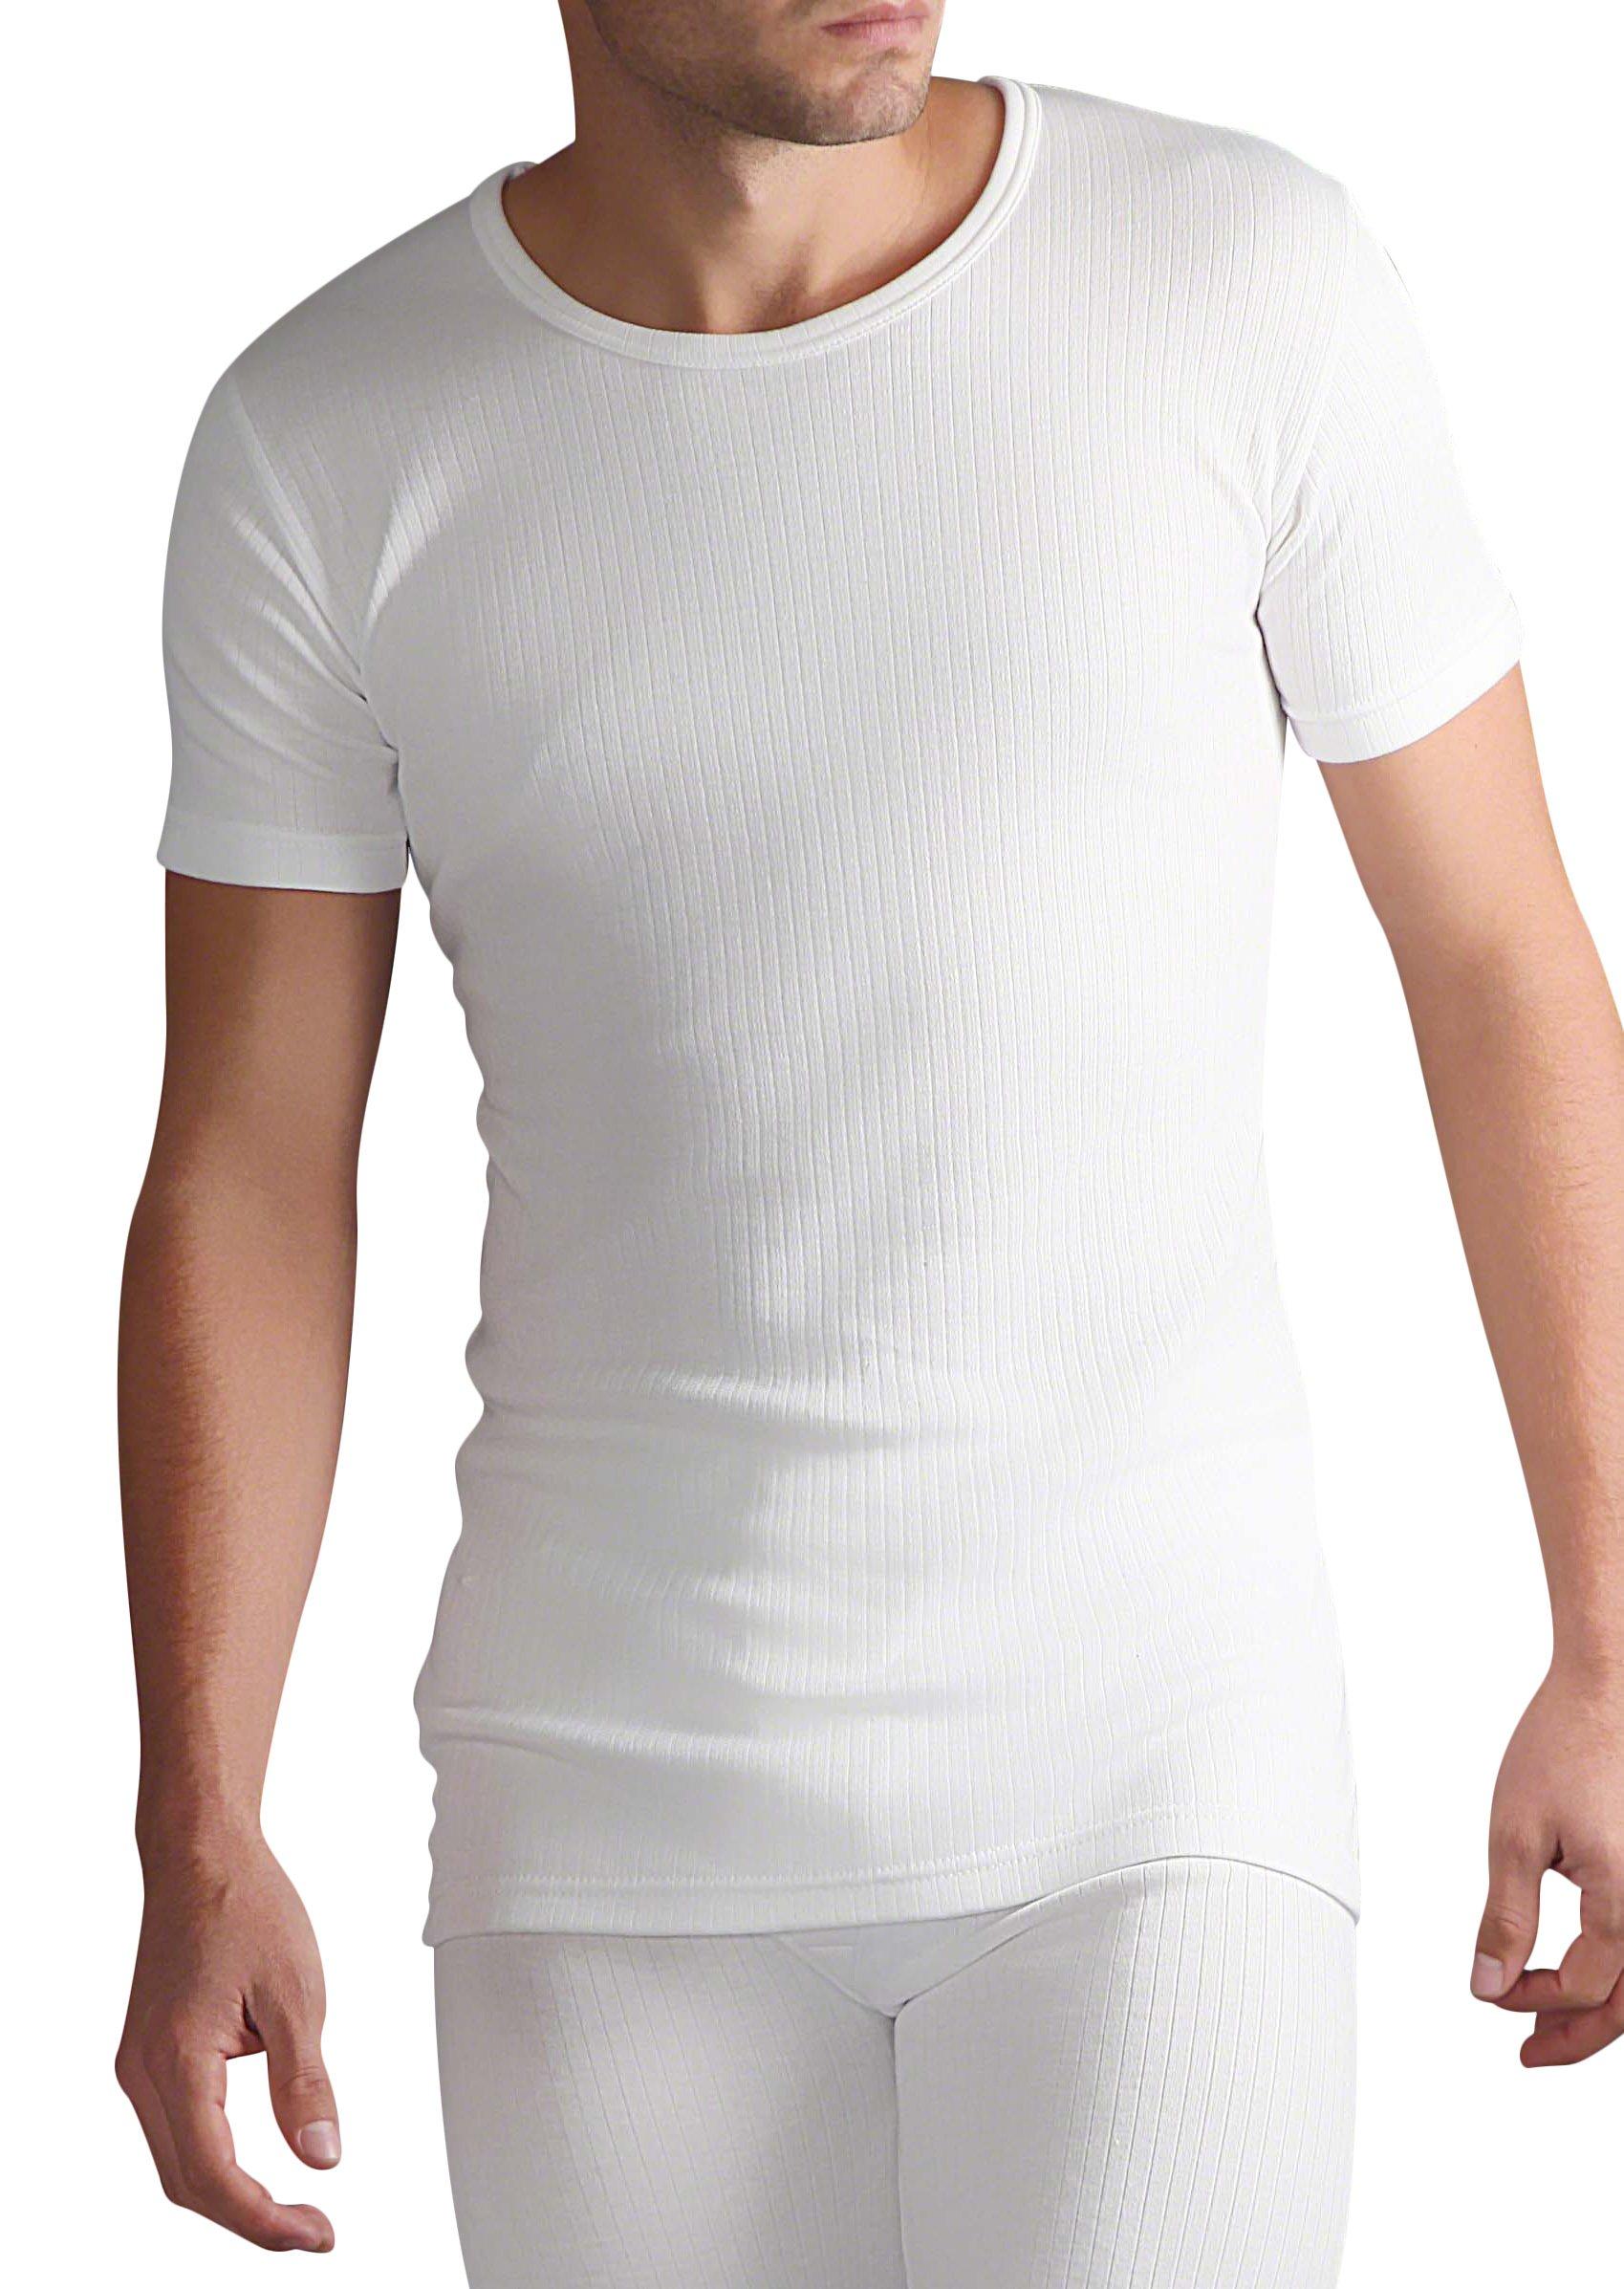 Heat Holders - Mens Winter Warm Thermal Underwear Short Sleeve Vest Top Shirt (Large: 41-43'' Chest, White)